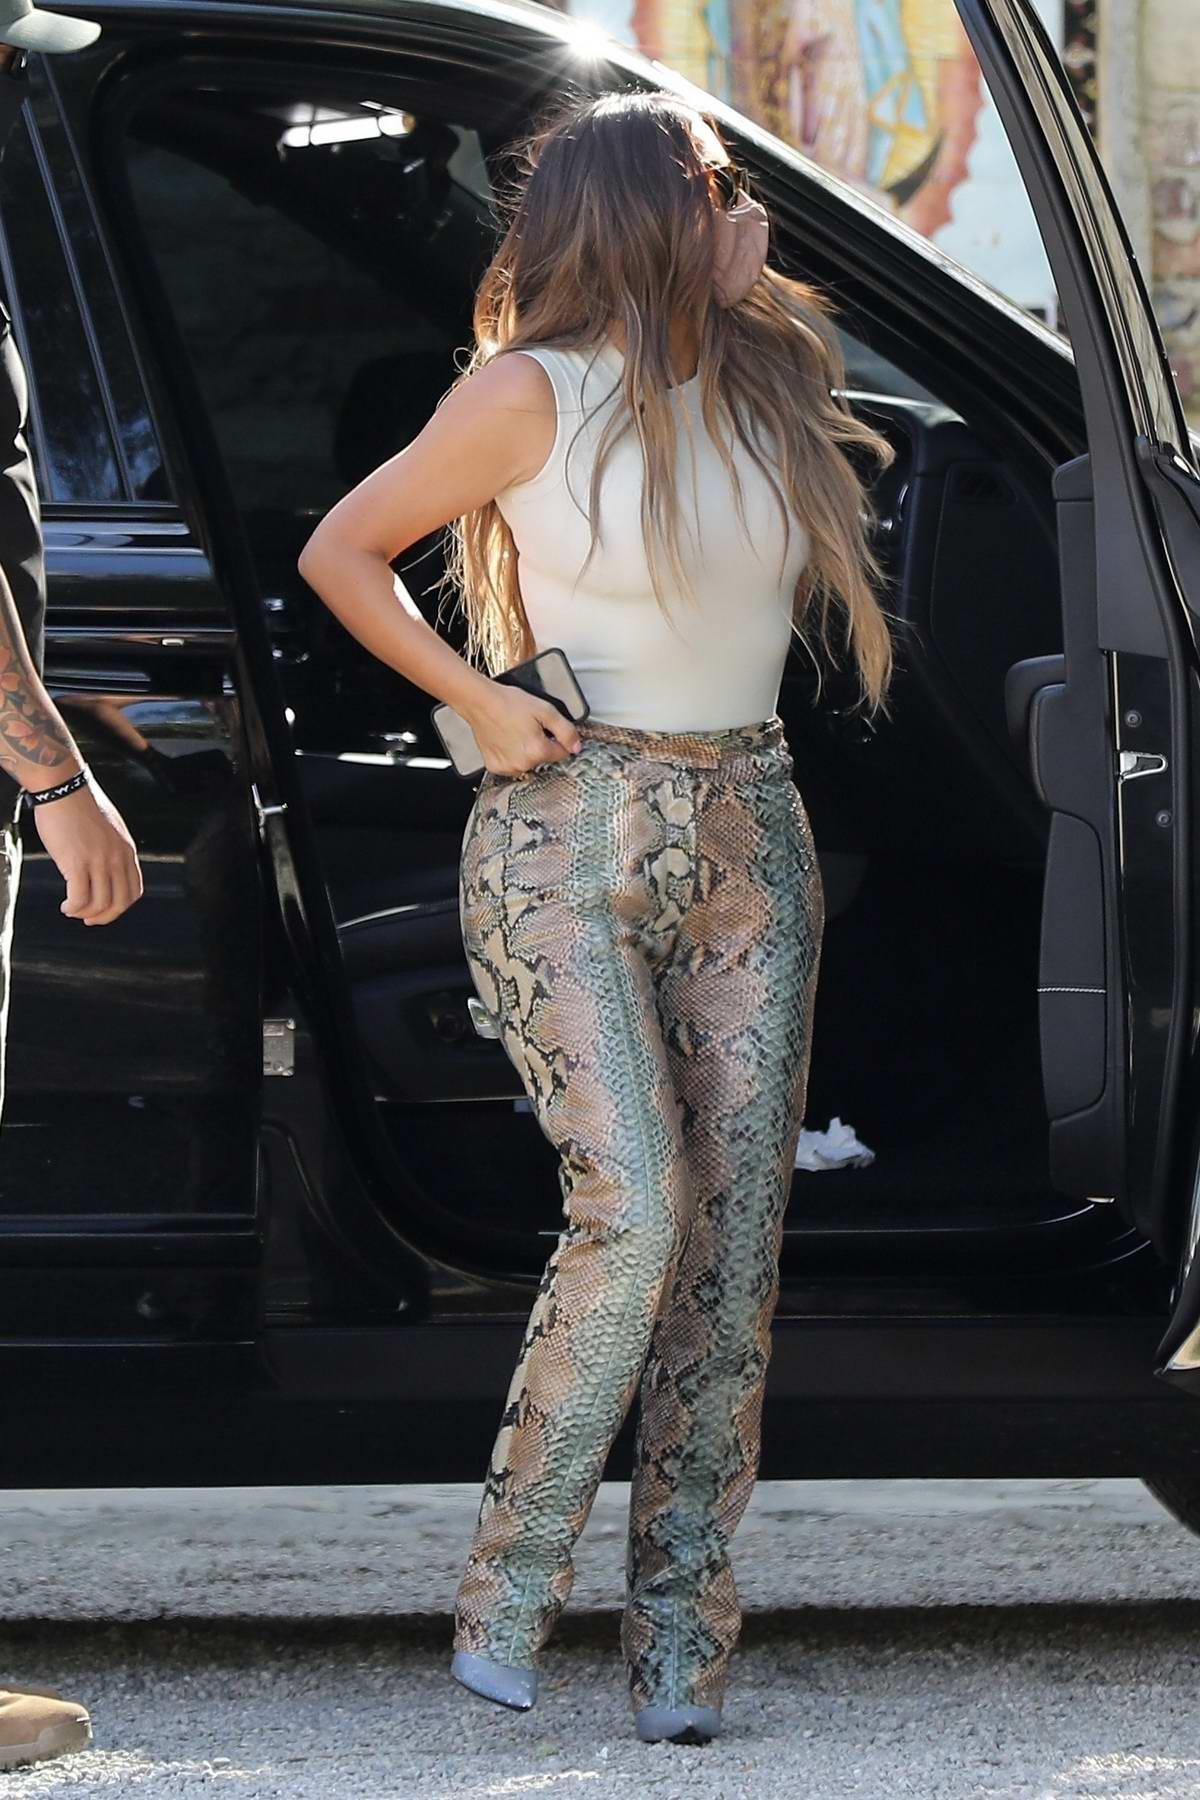 Kim Kardashian and Khloe Kardashian seen while visiting a friend in Malibu, California